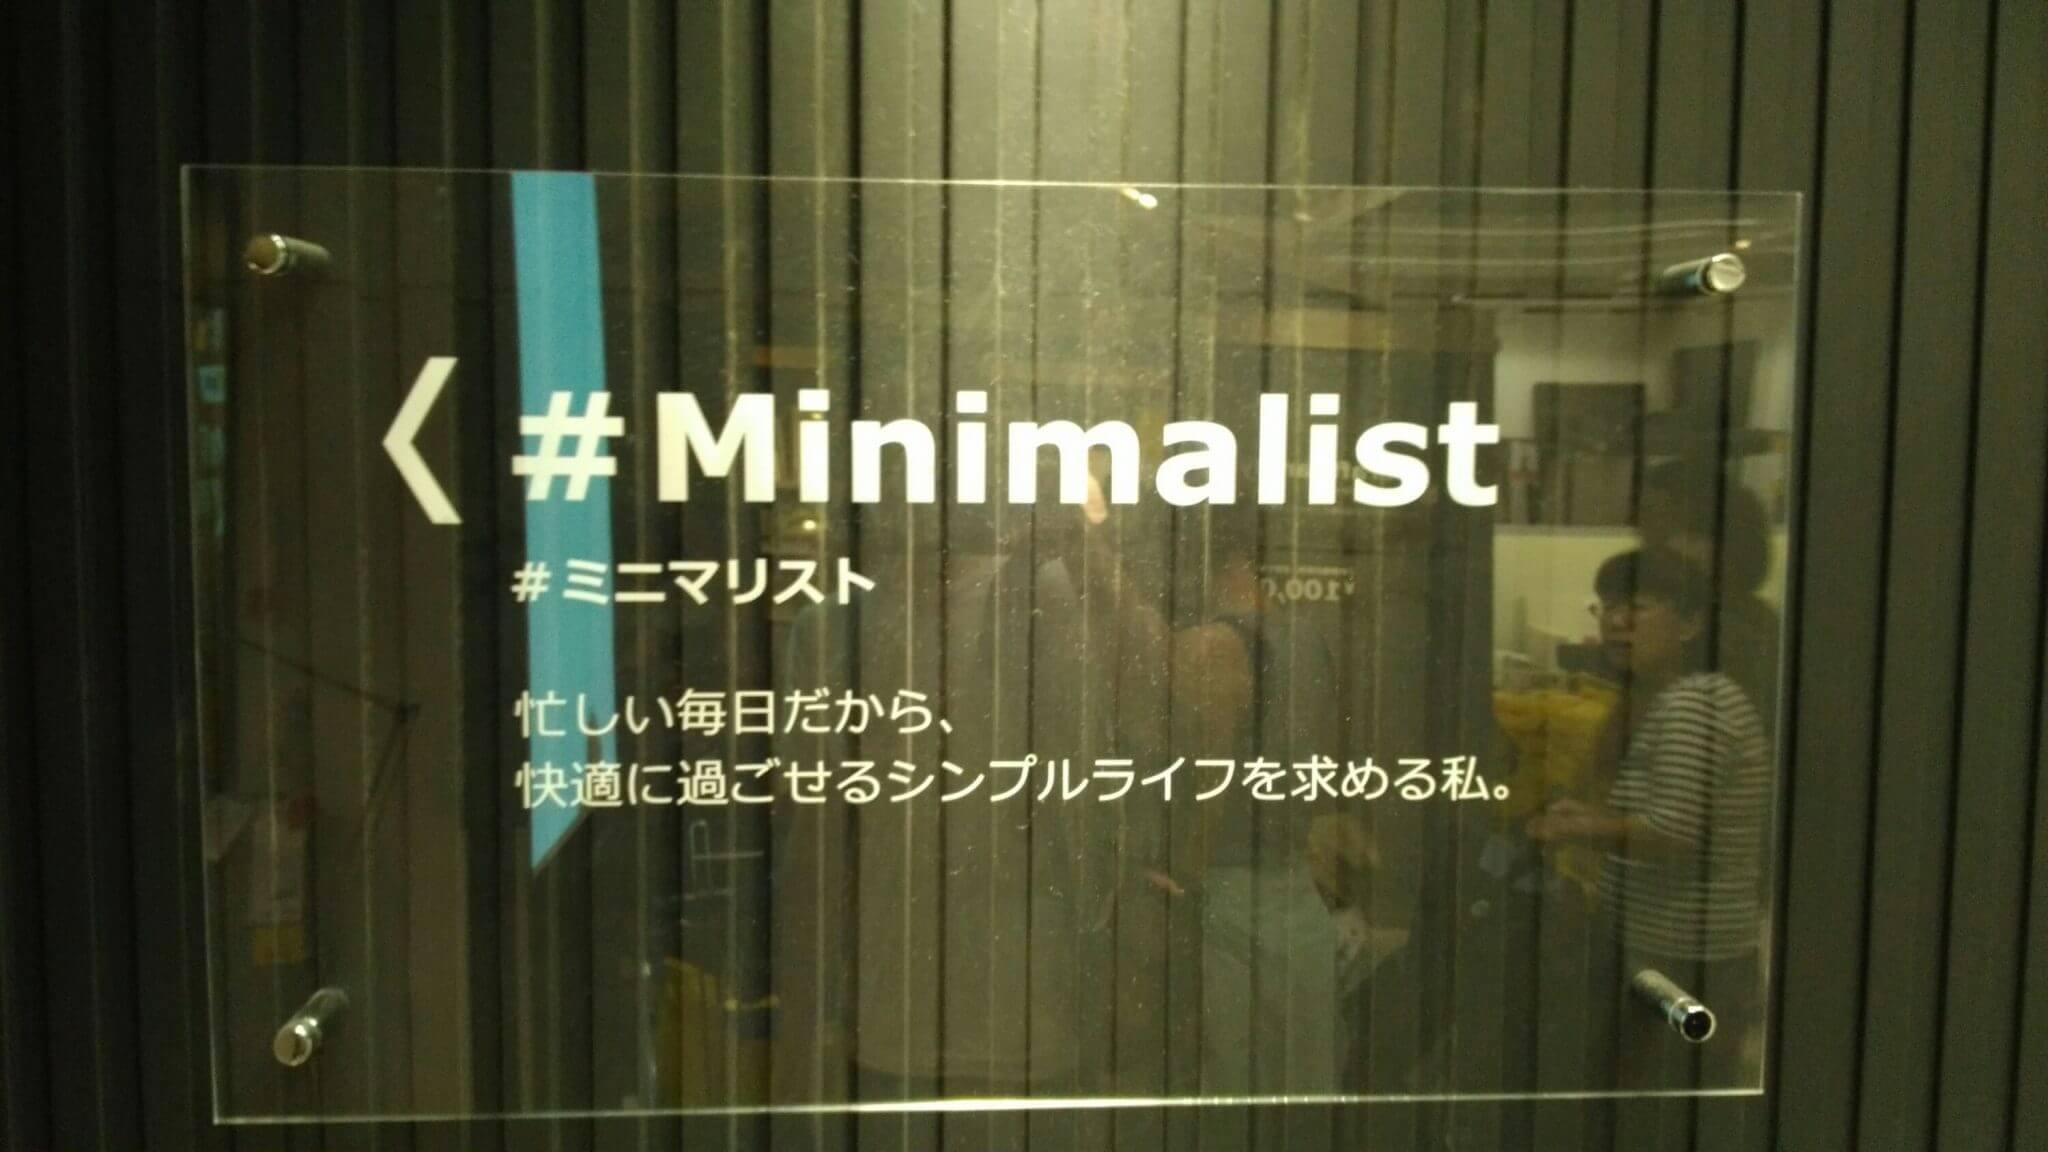 minimalist-ikea-0